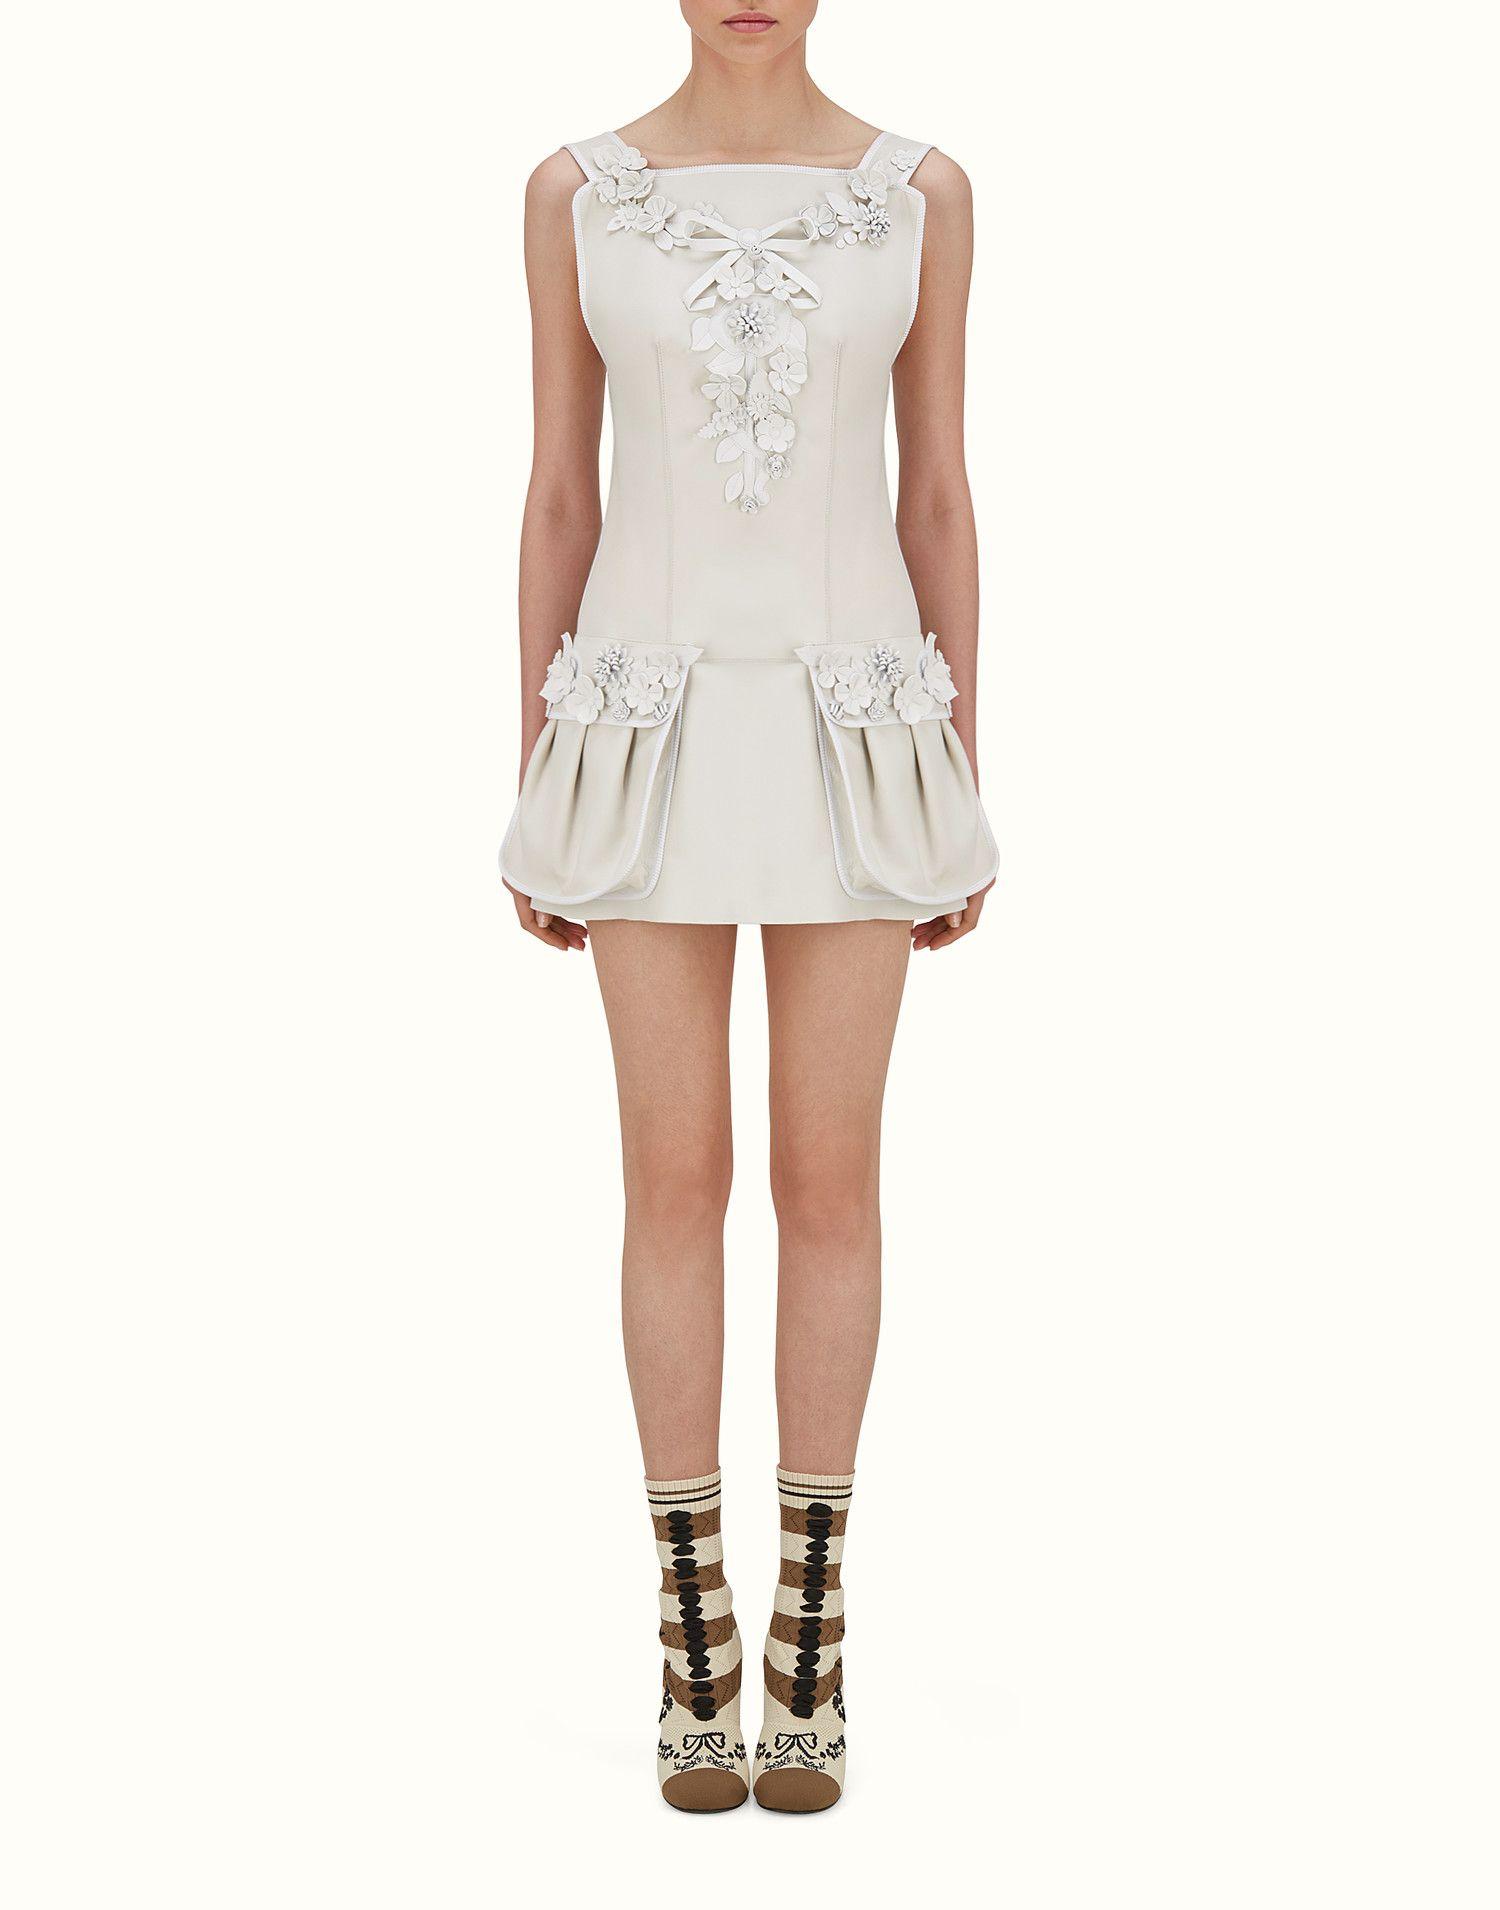 Fendi Short Dress Dress In White Nappa With Appliques View 1 Zoom Designer Outfits Woman Designer Shirt Dresses Short Dresses [ 1910 x 1500 Pixel ]